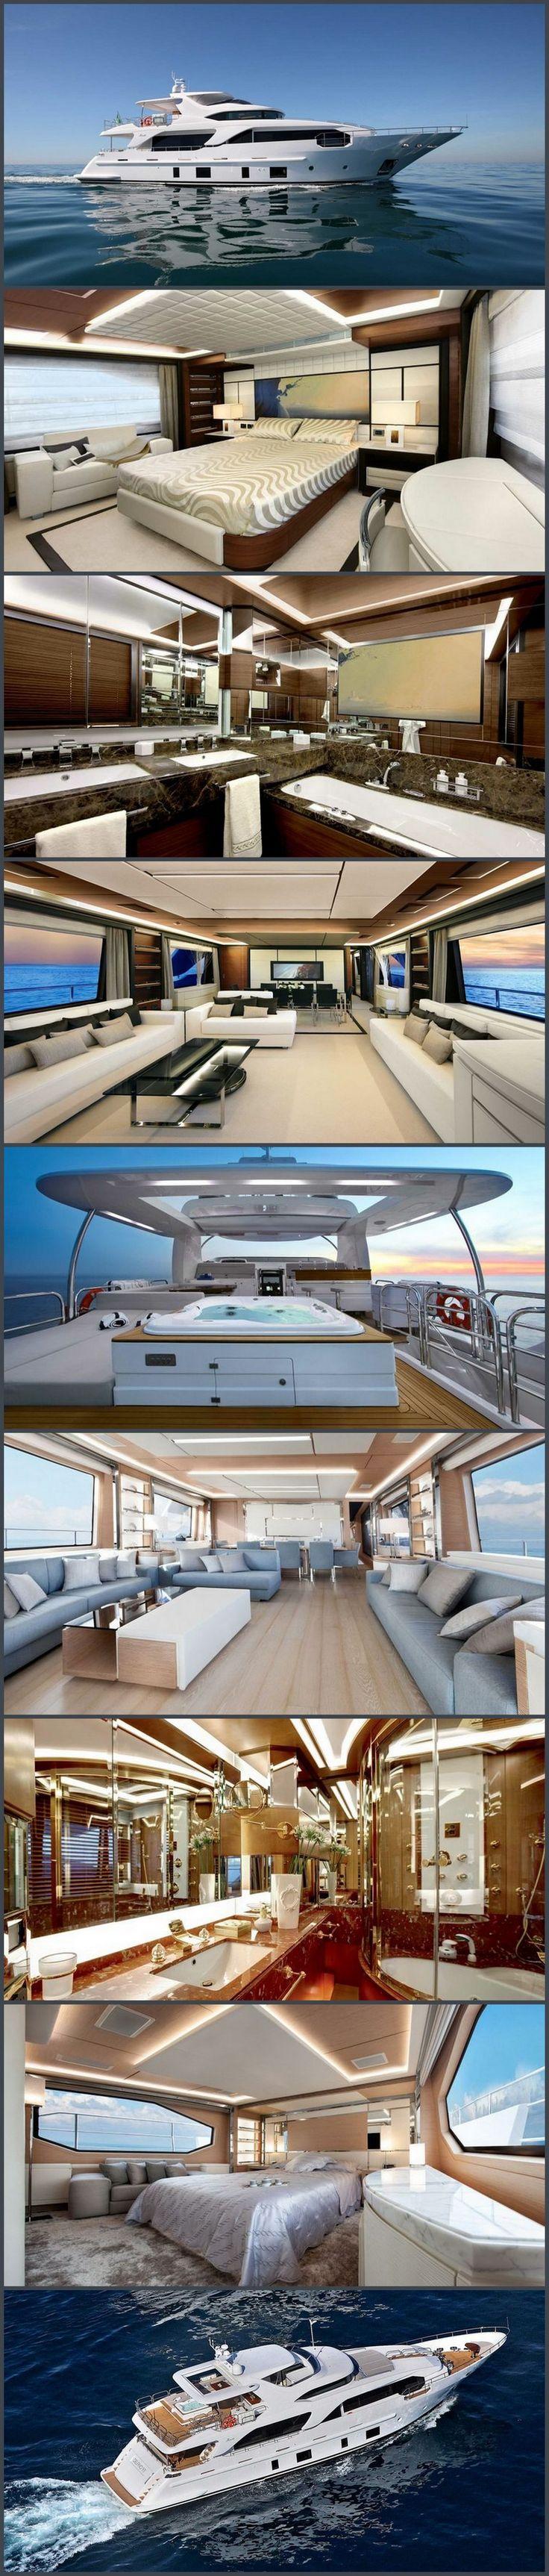 Benetti Delfino 93 Ocean Drive Luxury Yacht - Style Estate -